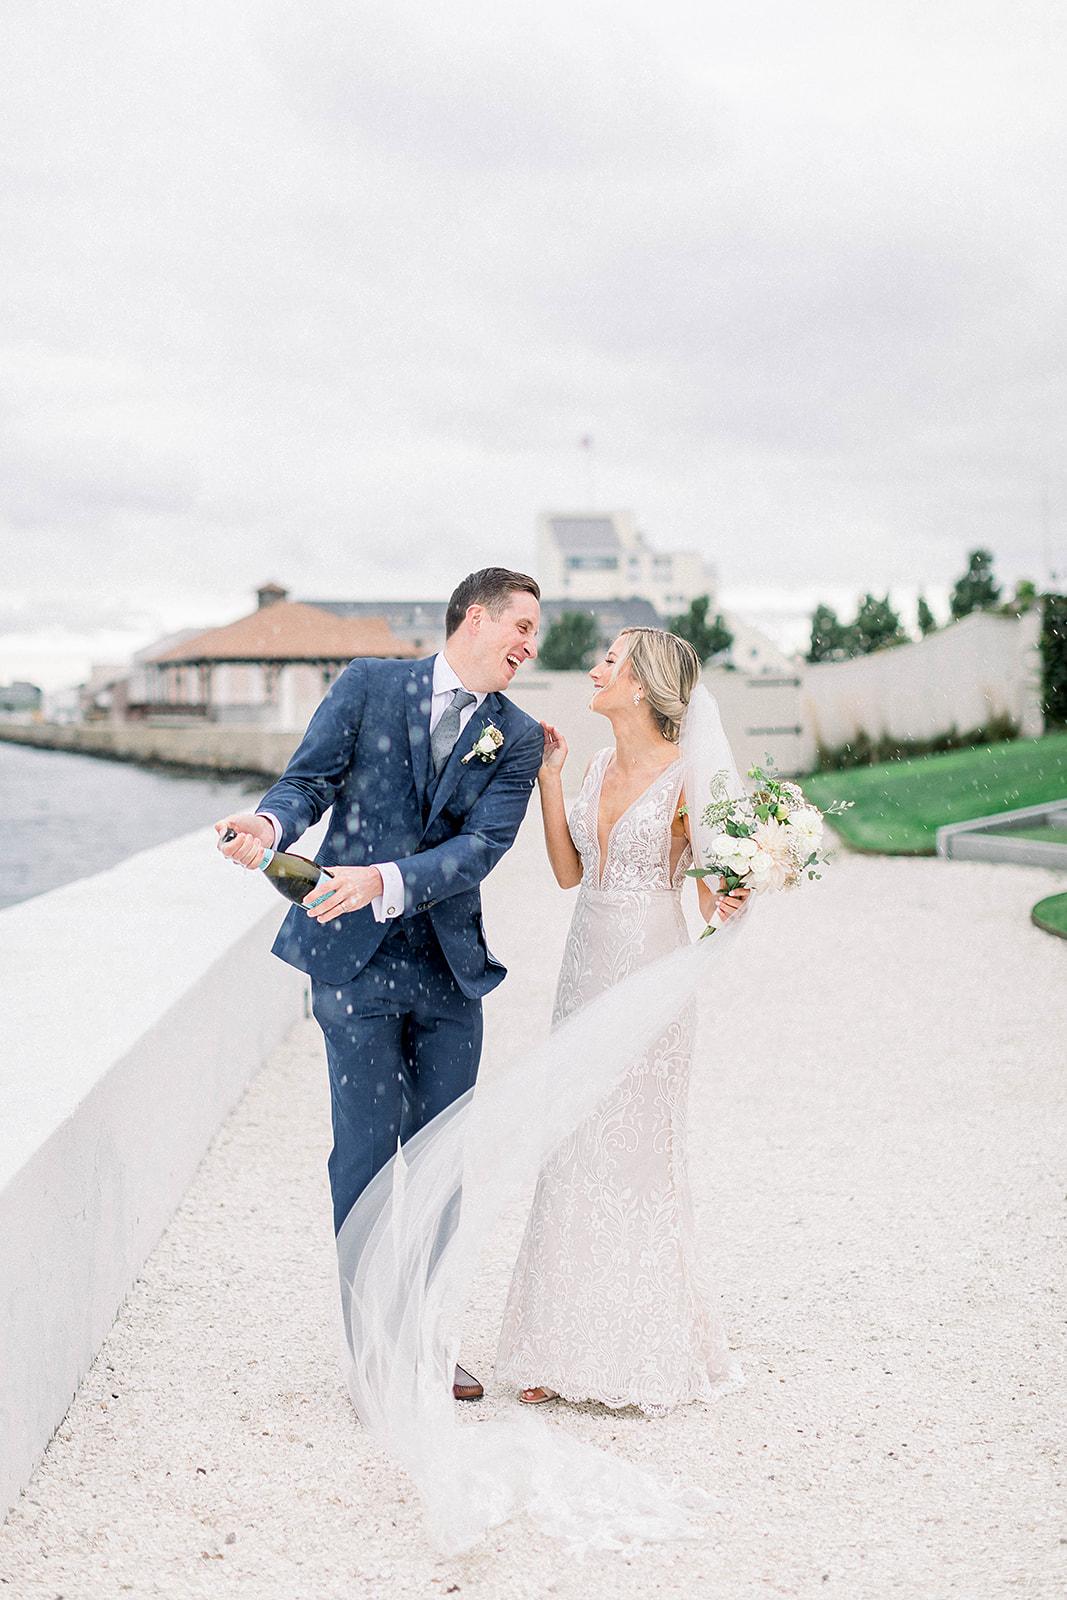 Cape May beach Wedding